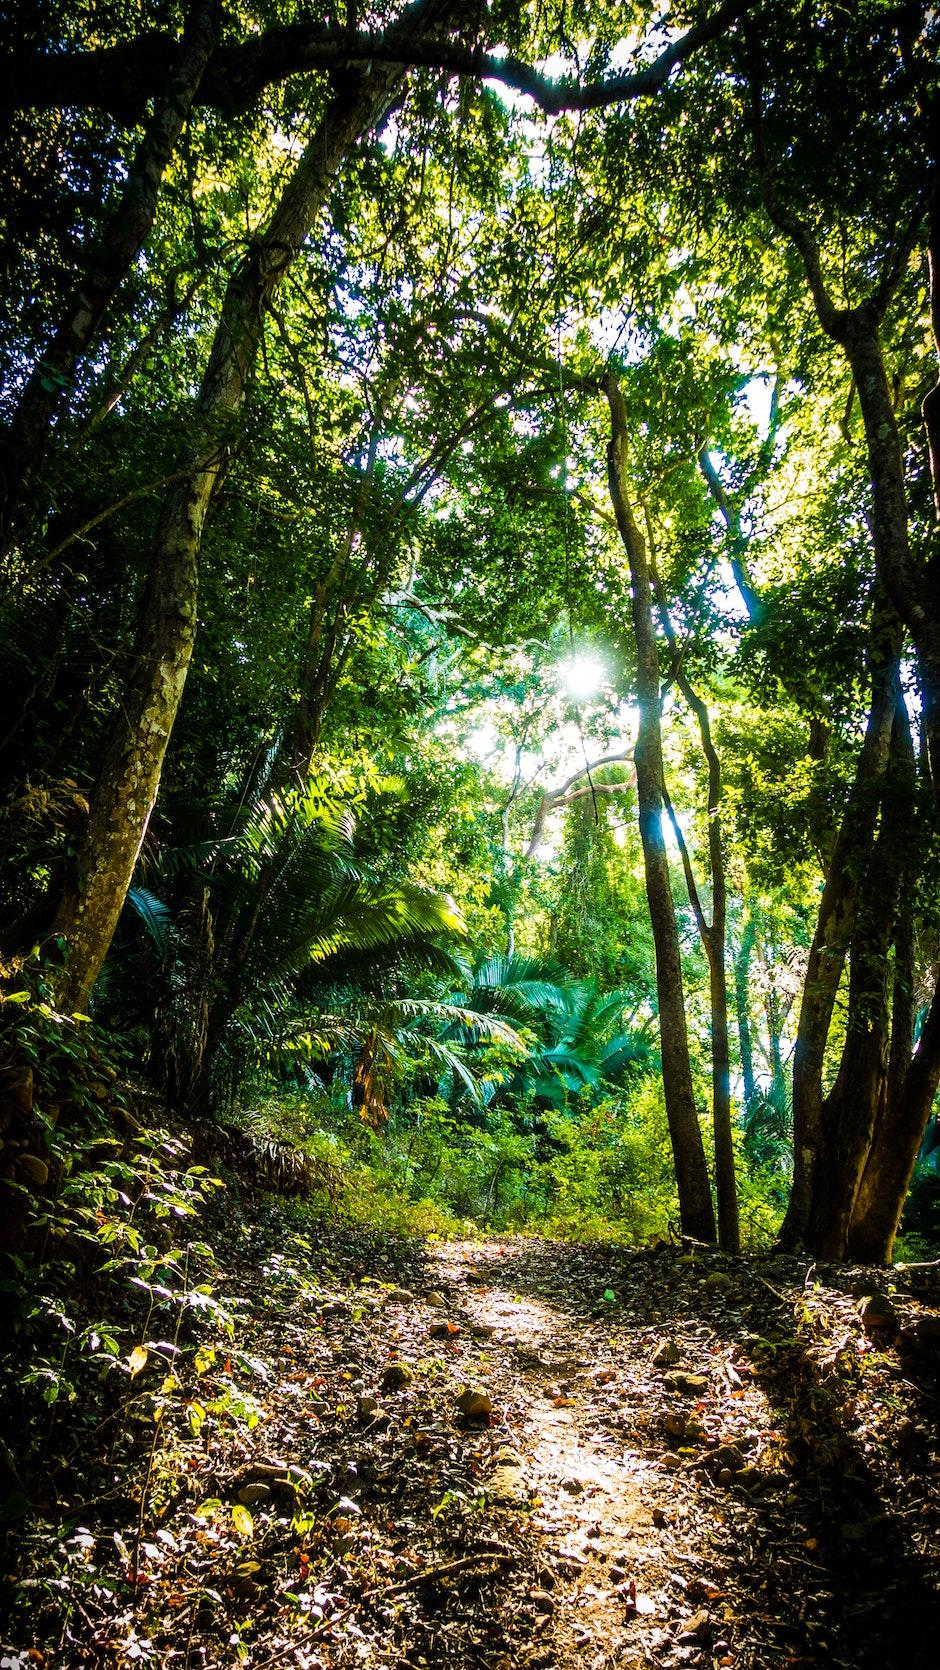 daylight, environment, foot path